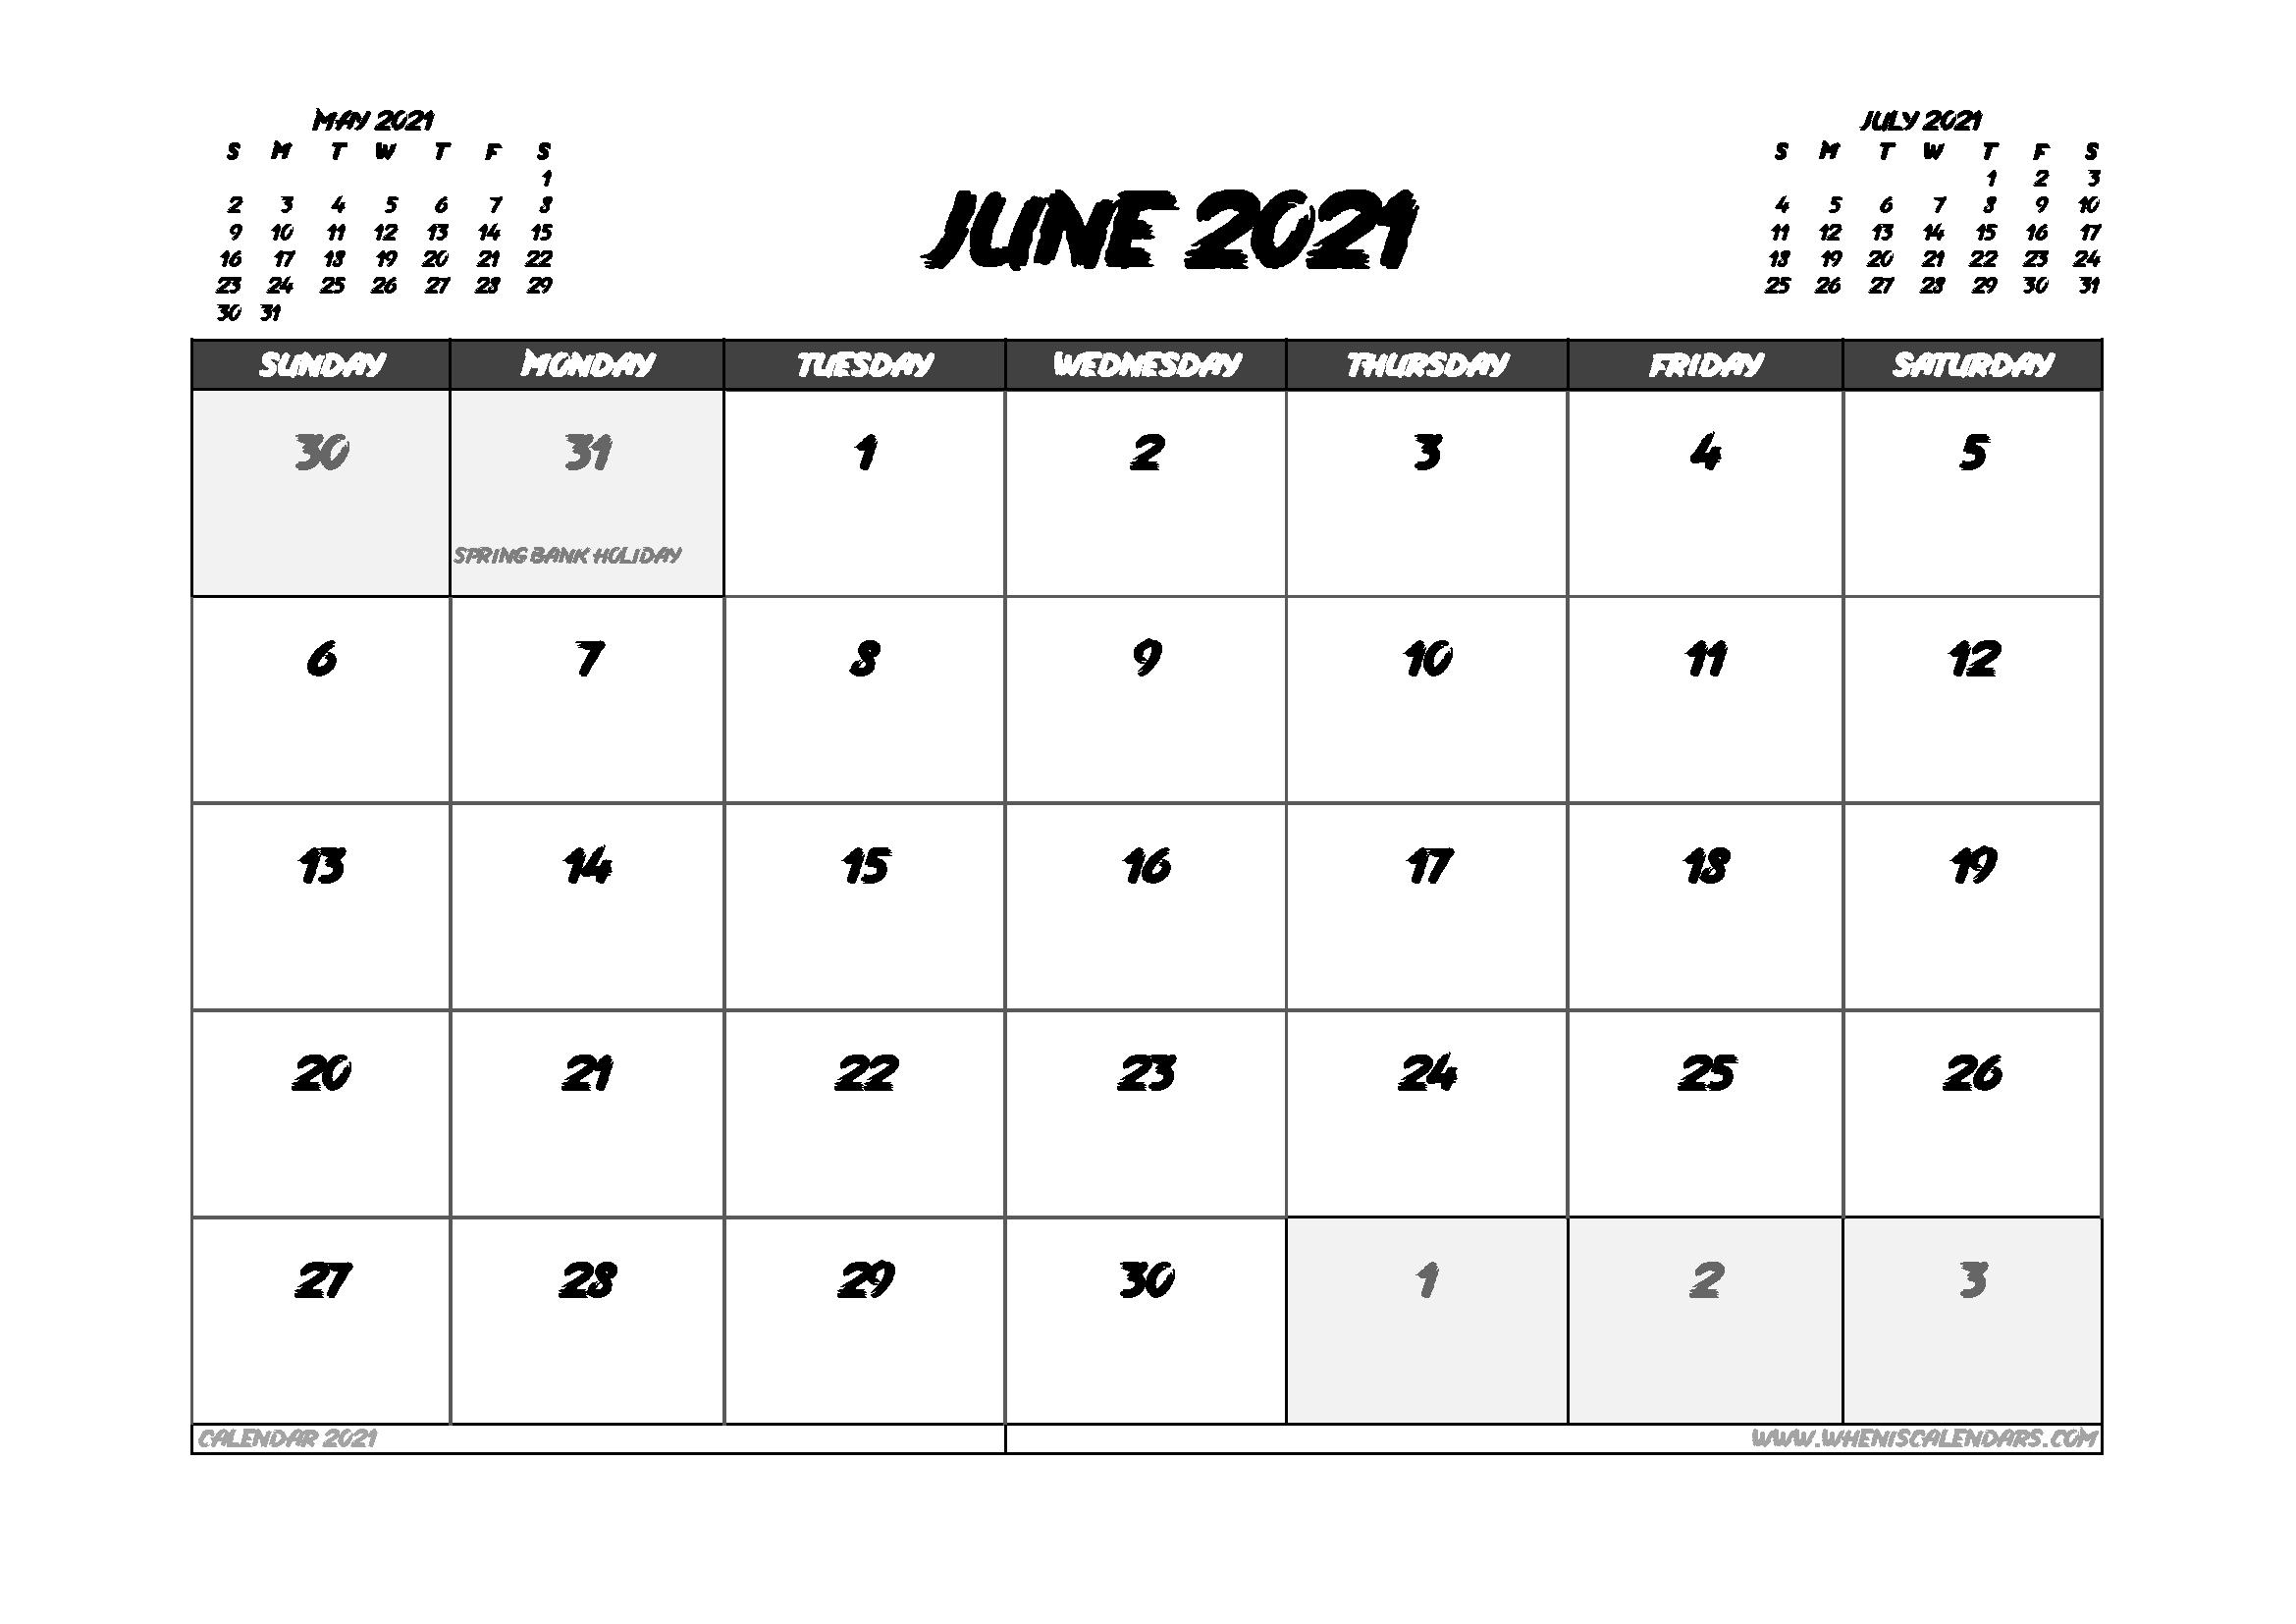 June 2021 Calendar Uk With Holidays In 2020 Calendar Uk 2021 Calendar Calendar